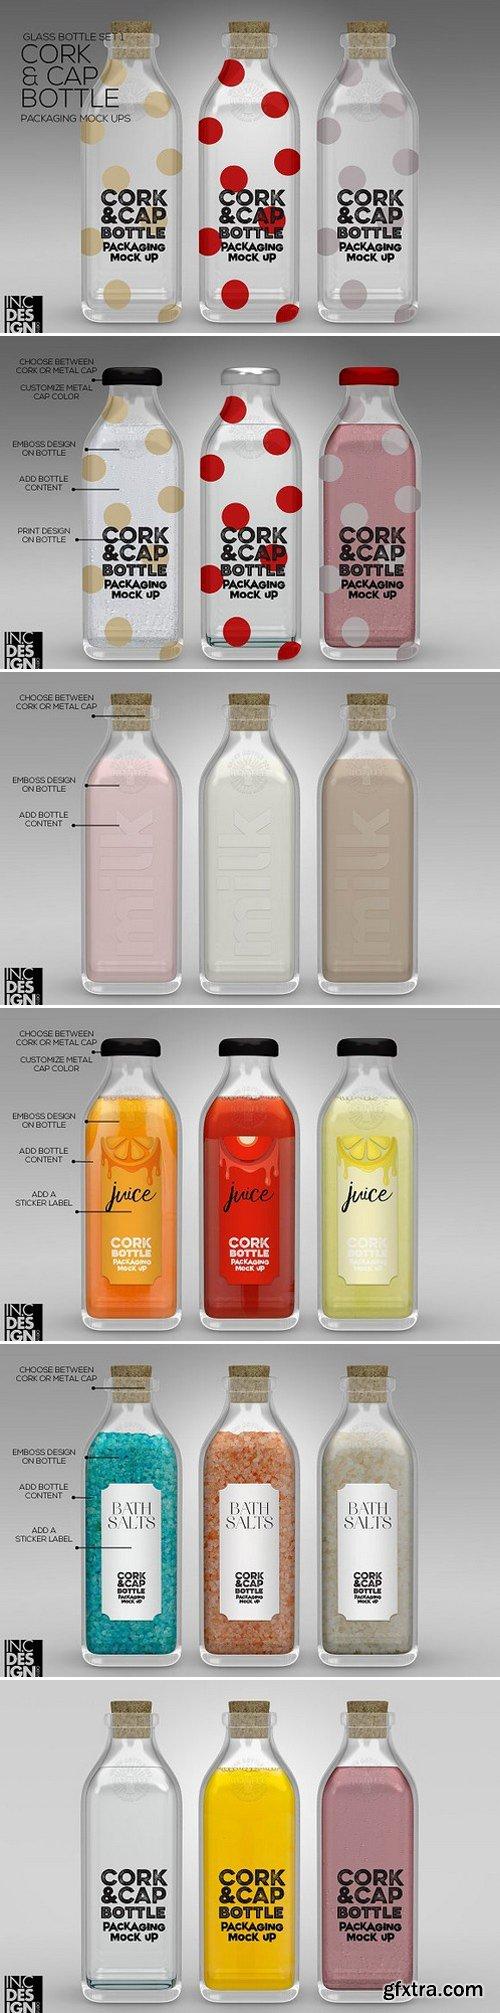 CM - Cork & Cap Bottle Packaging MockUps 1045773